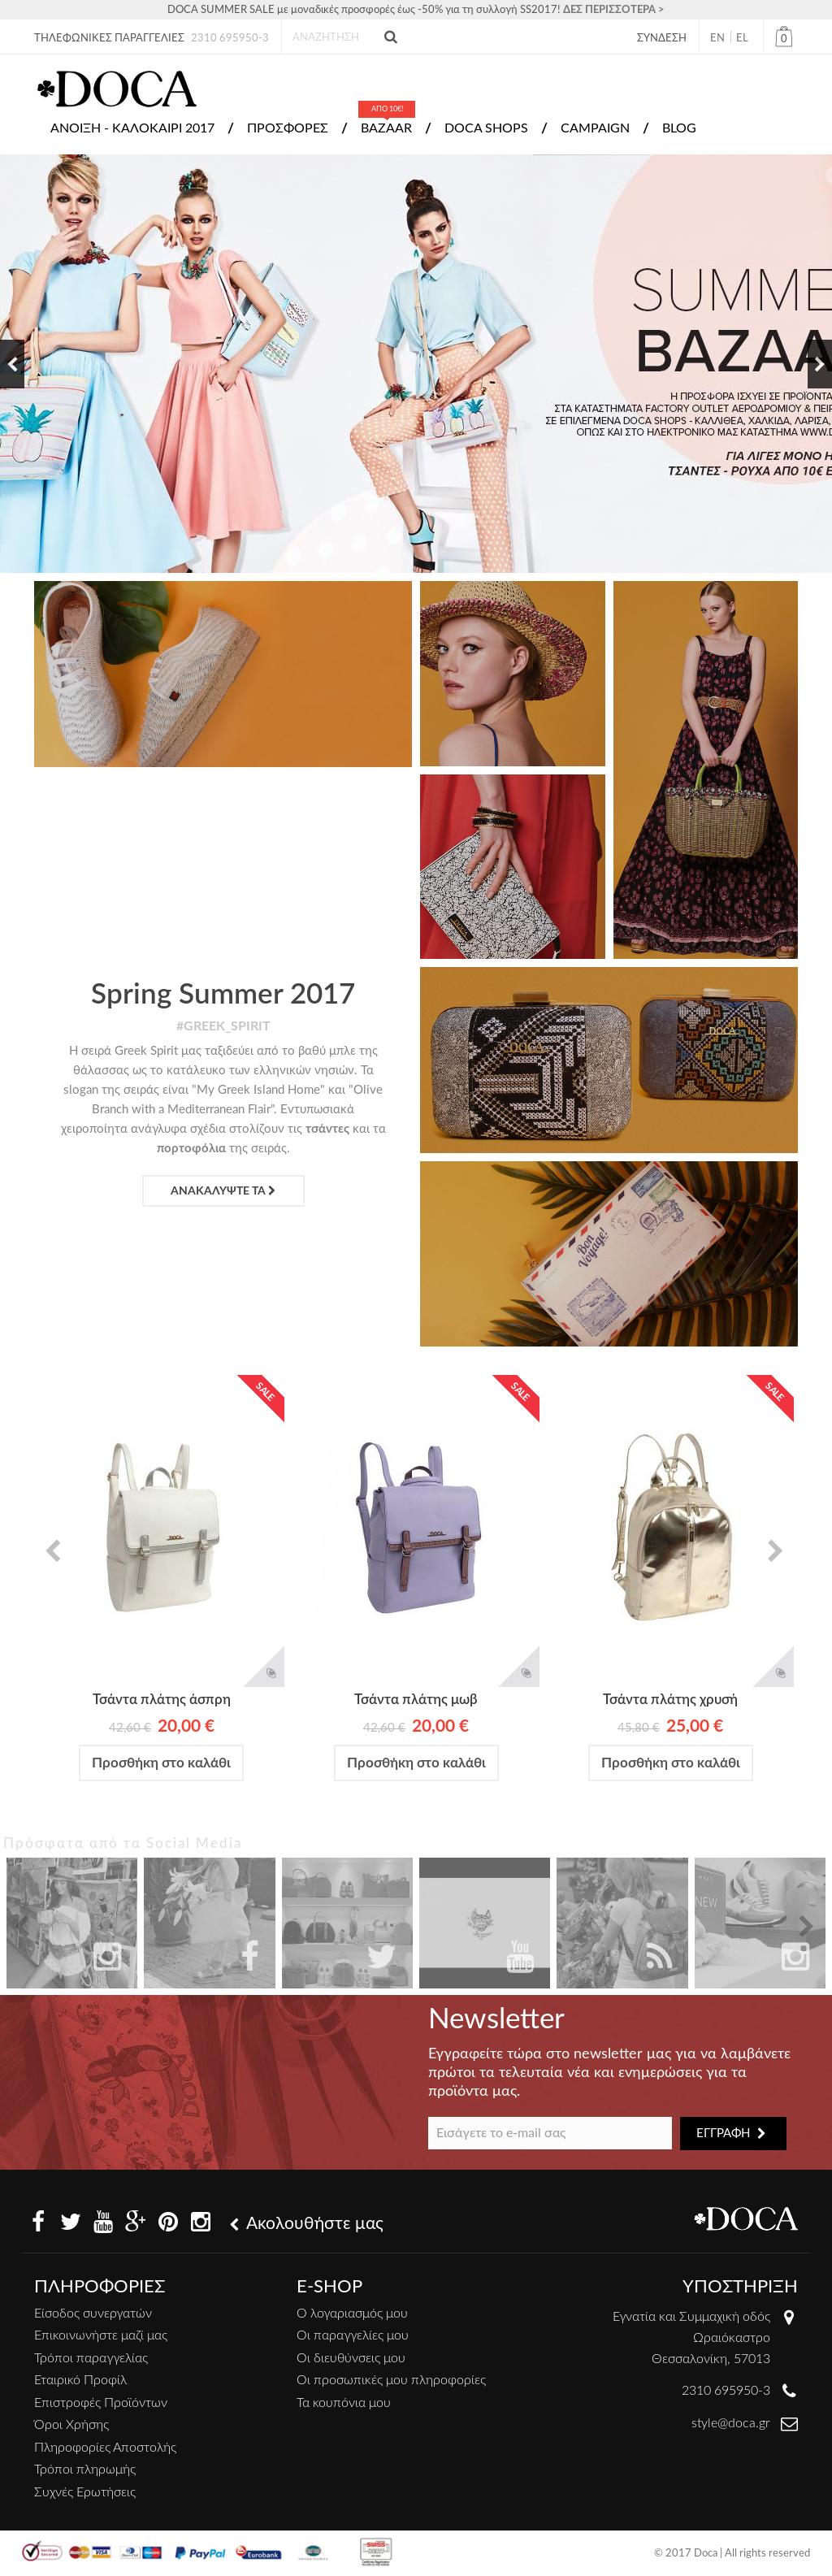 5db03b2aaa Doca Bags + Accessories Competitors